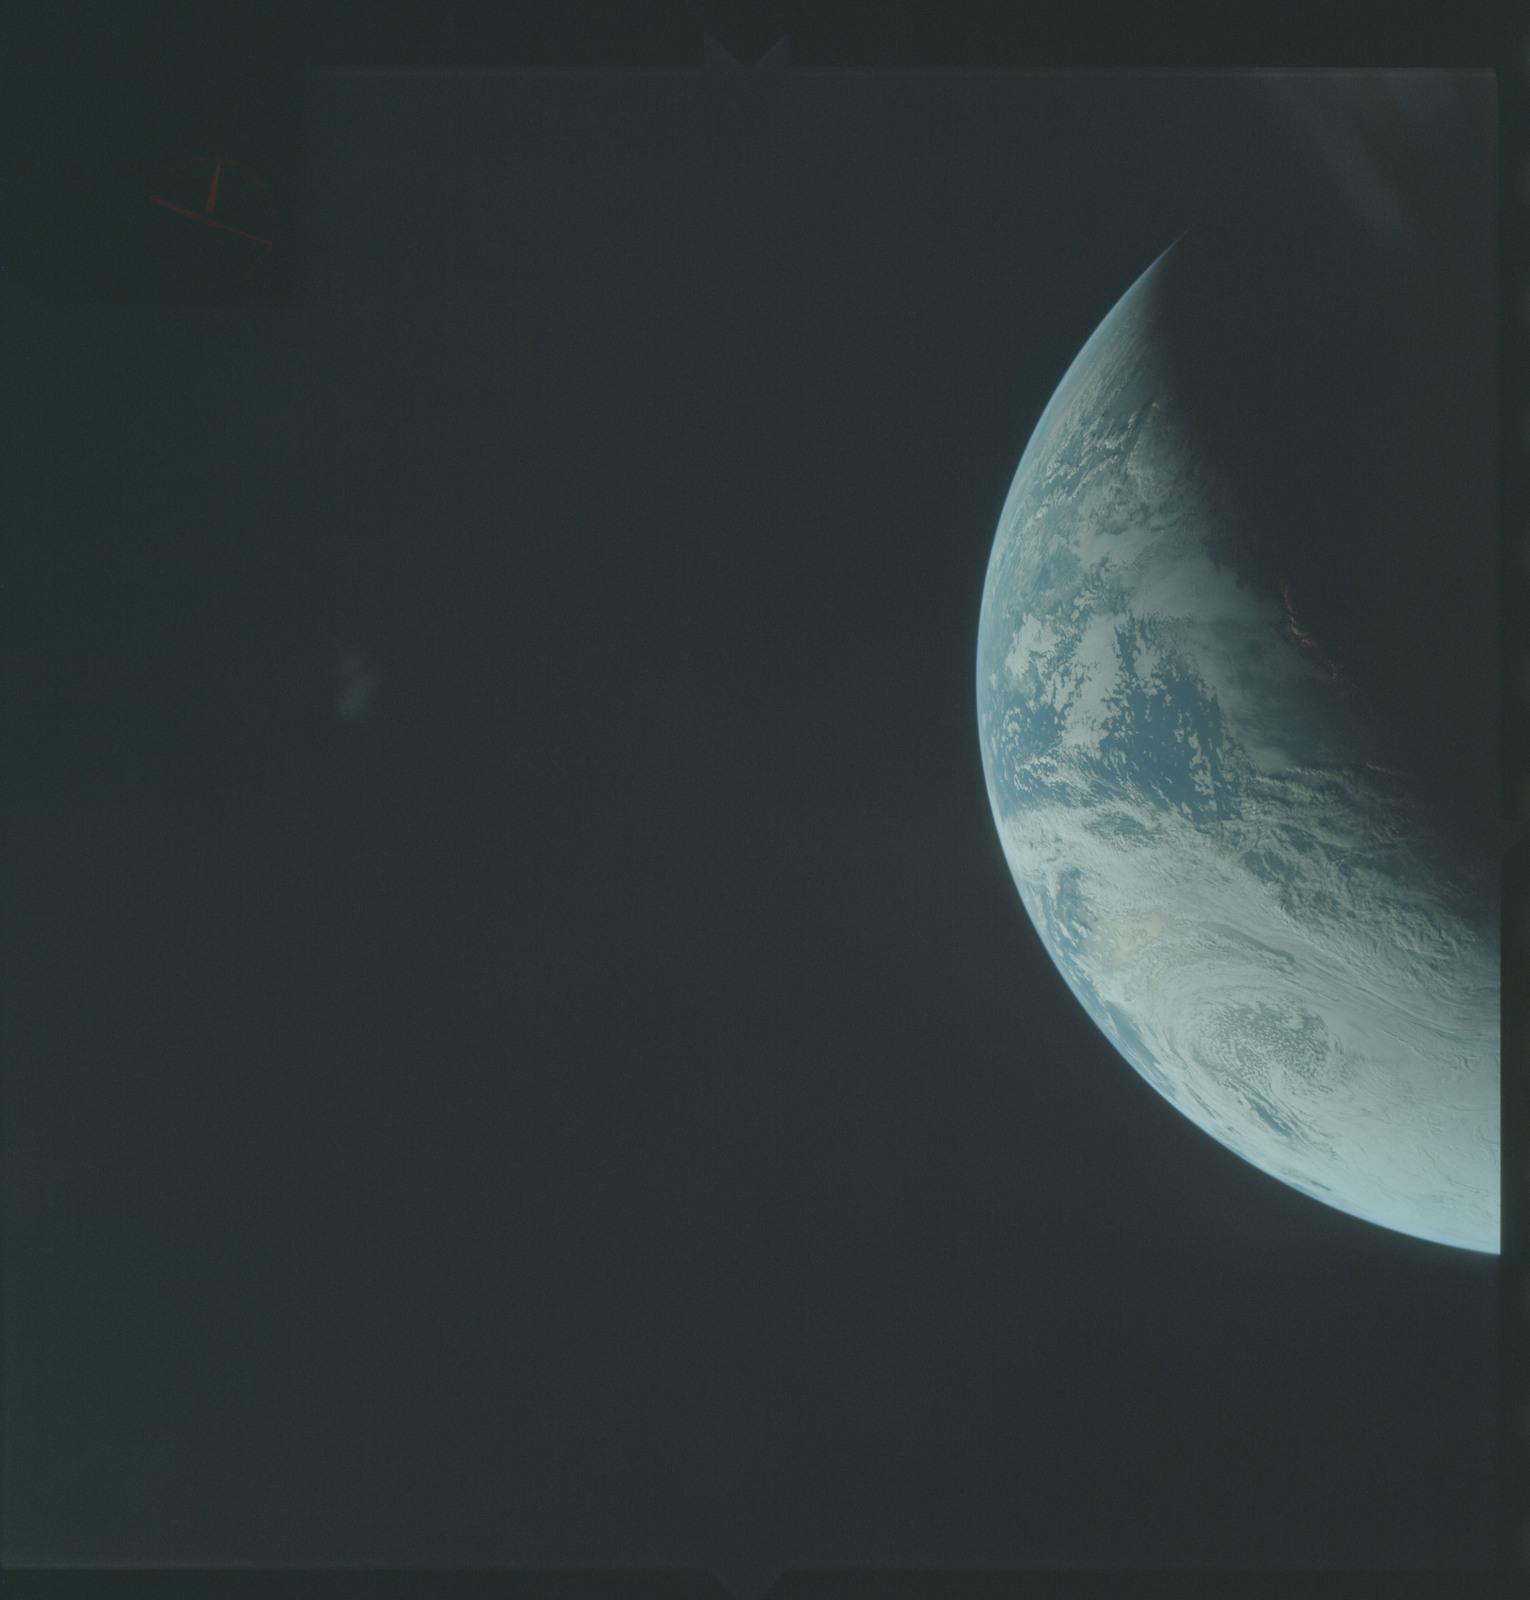 AS04-01-260 - Apollo 4 - Apollo 4 Mission - Atlantic Ocean,coastal Brazil and West Africa